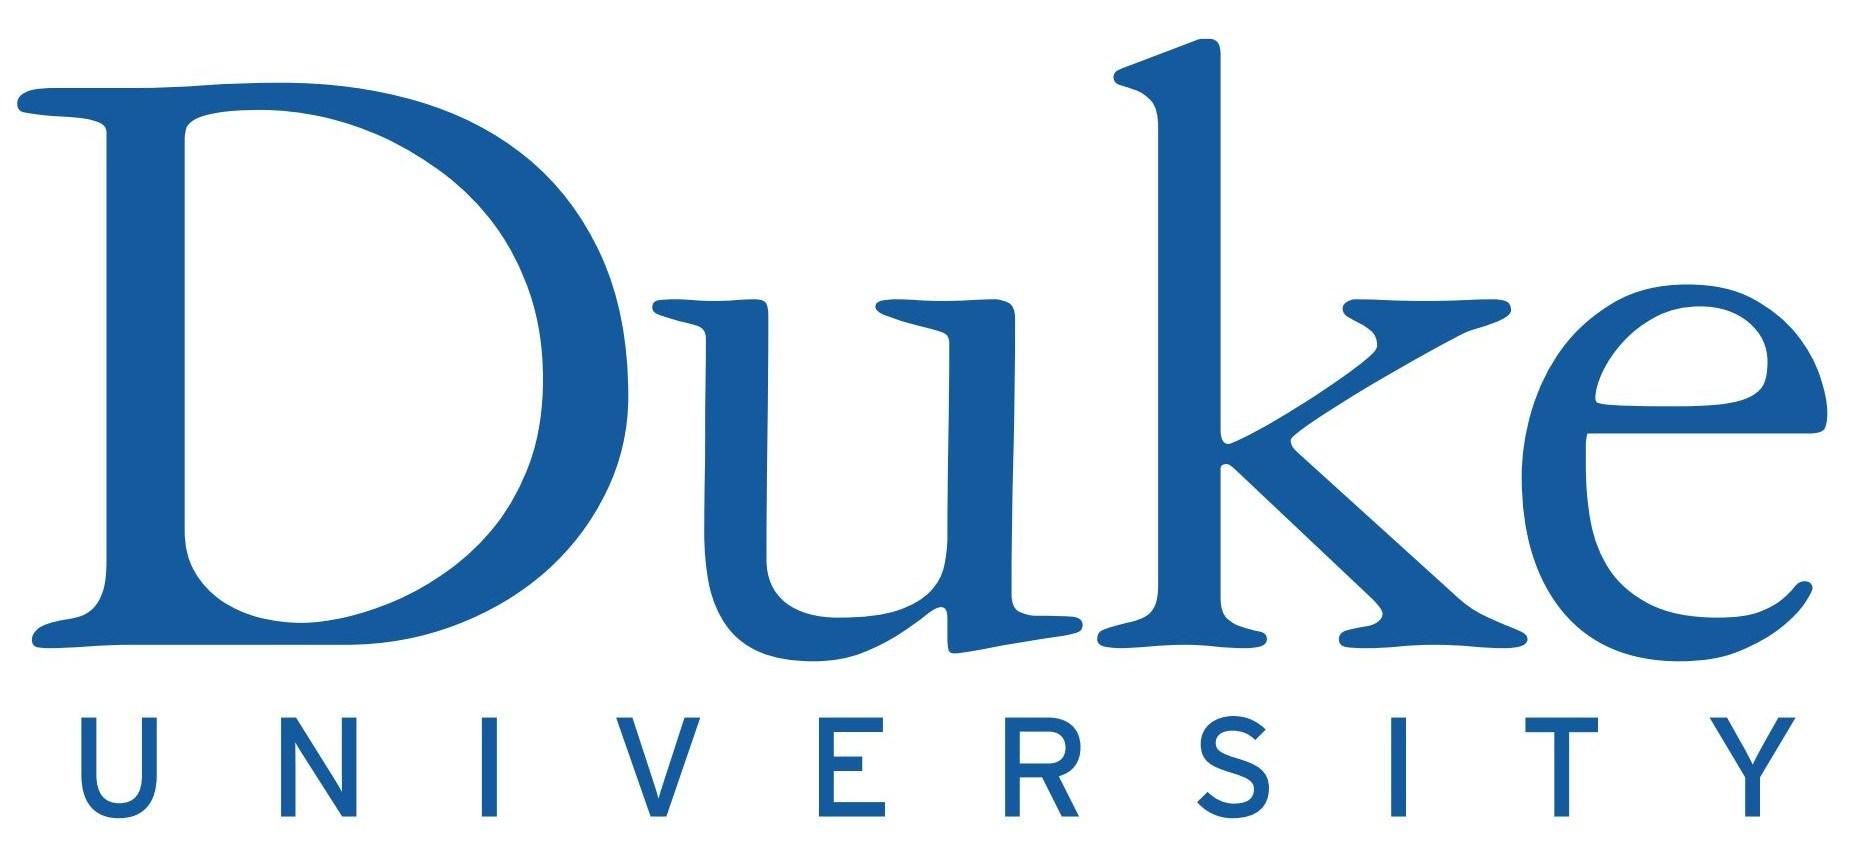 Duke University Logo and Crest Vector EPS Free Download, Logo, Icons, Brand Emblems